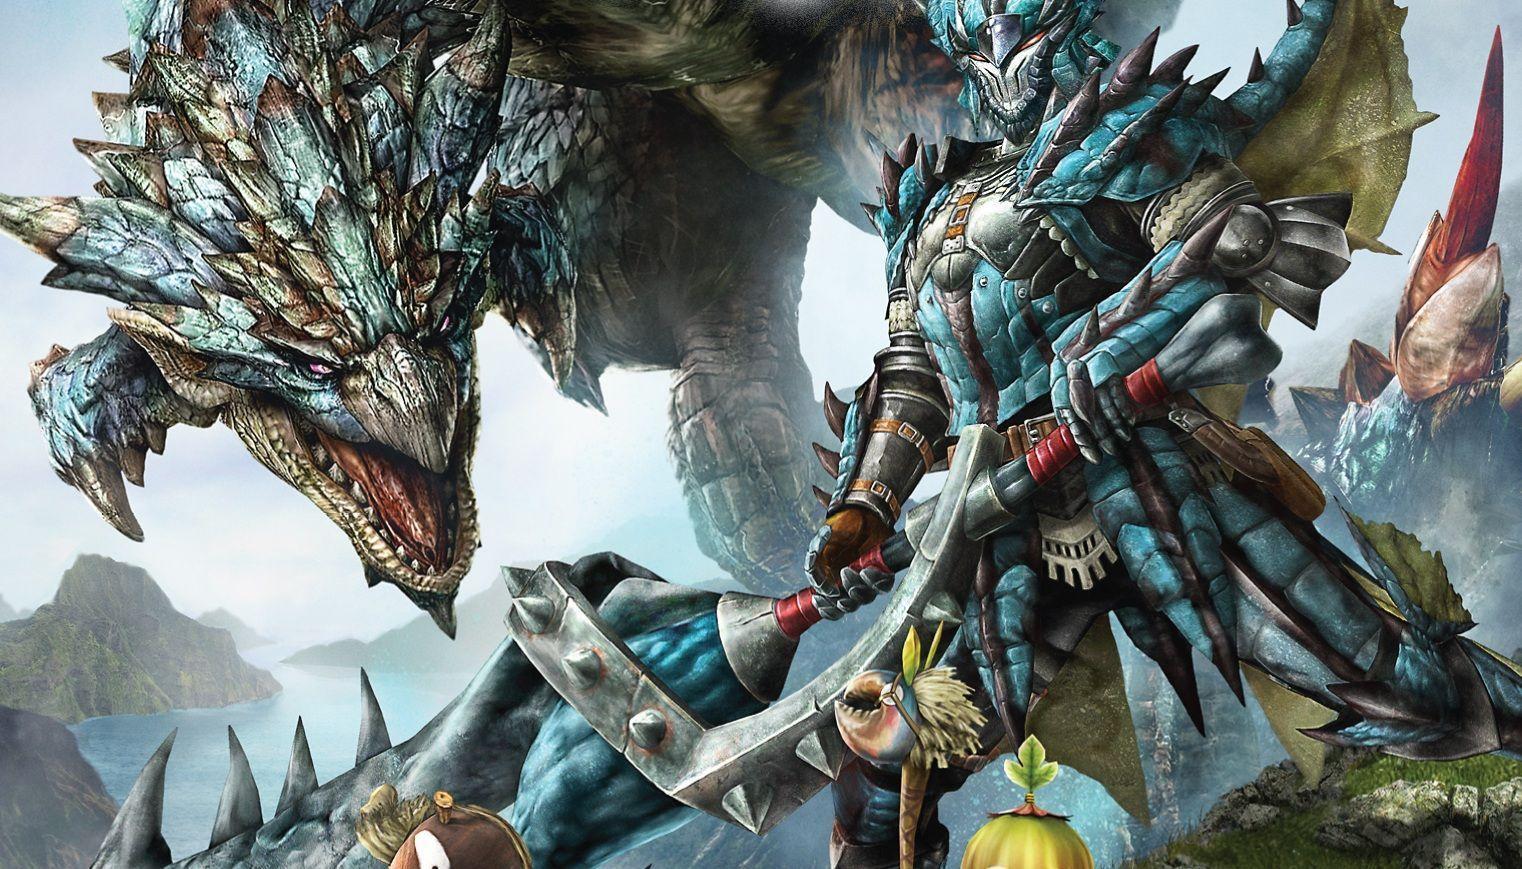 Monster Hunter 4u Wallpapers Top Free Monster Hunter 4u